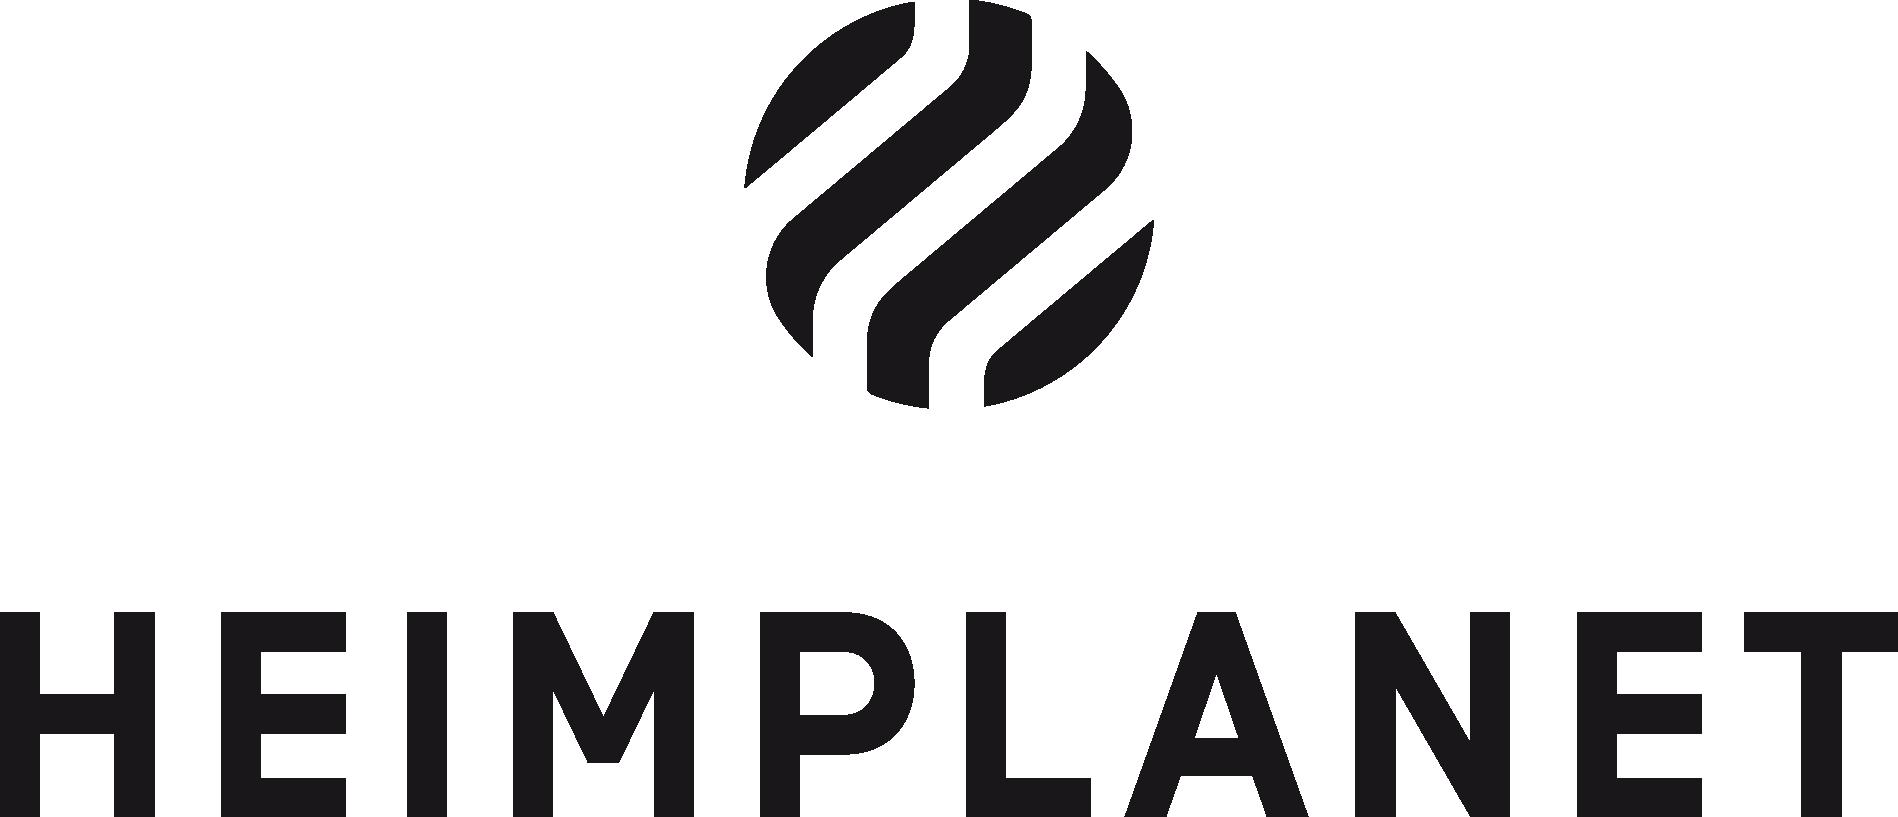 34Li8EXqQzuuCDp1jTwC_heimplanet-logo-01.png